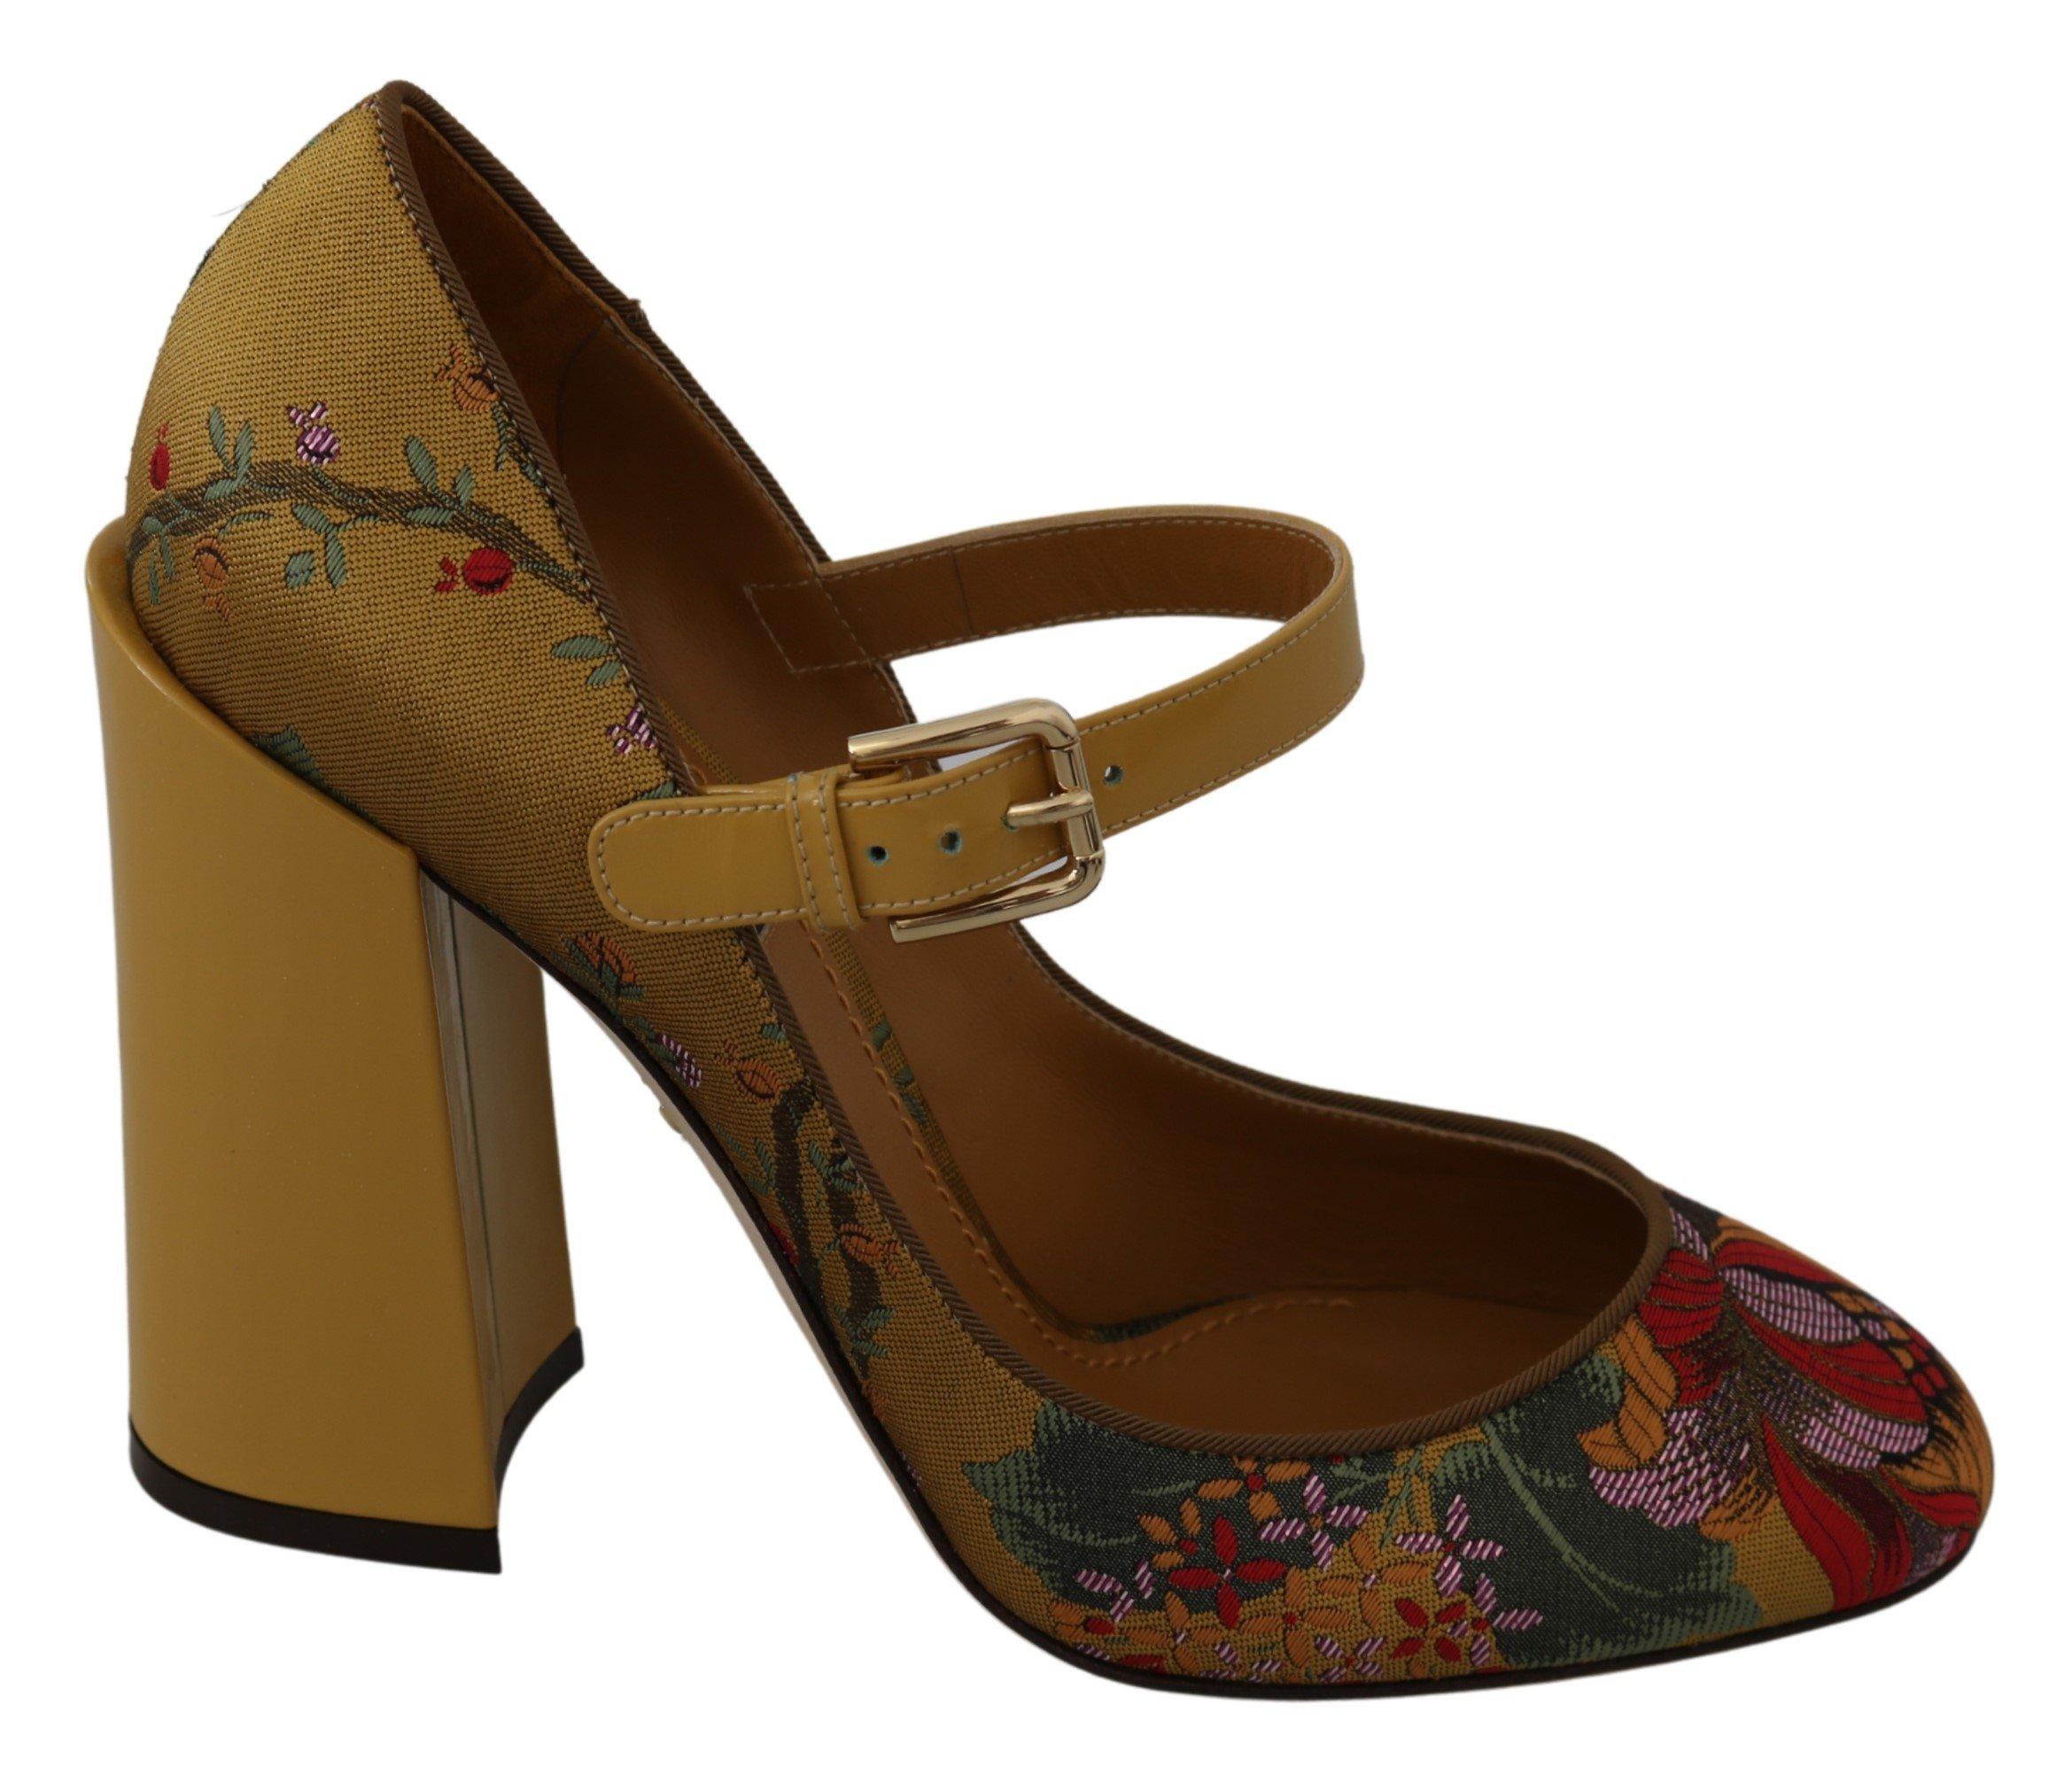 Dolce & Gabbana Women's Mary Janes Leather Pumps Yellow LA7334 - EU39/US8.5